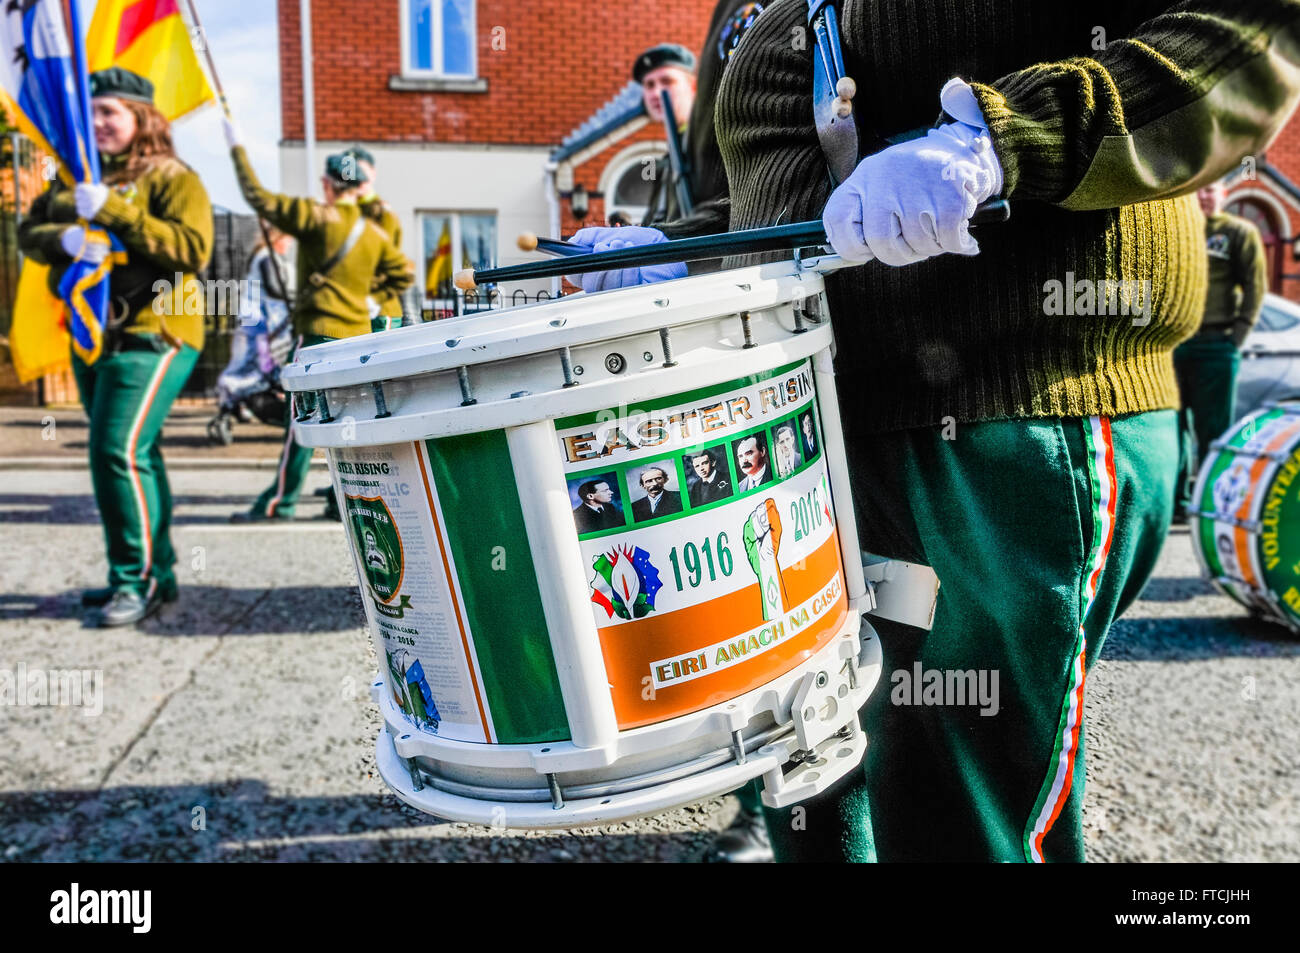 Belfast, Northern Ireland. 27 Mar 2016 - Scottish drummer at the Easter Rising centenary celebration parade. Credit: Stock Photo